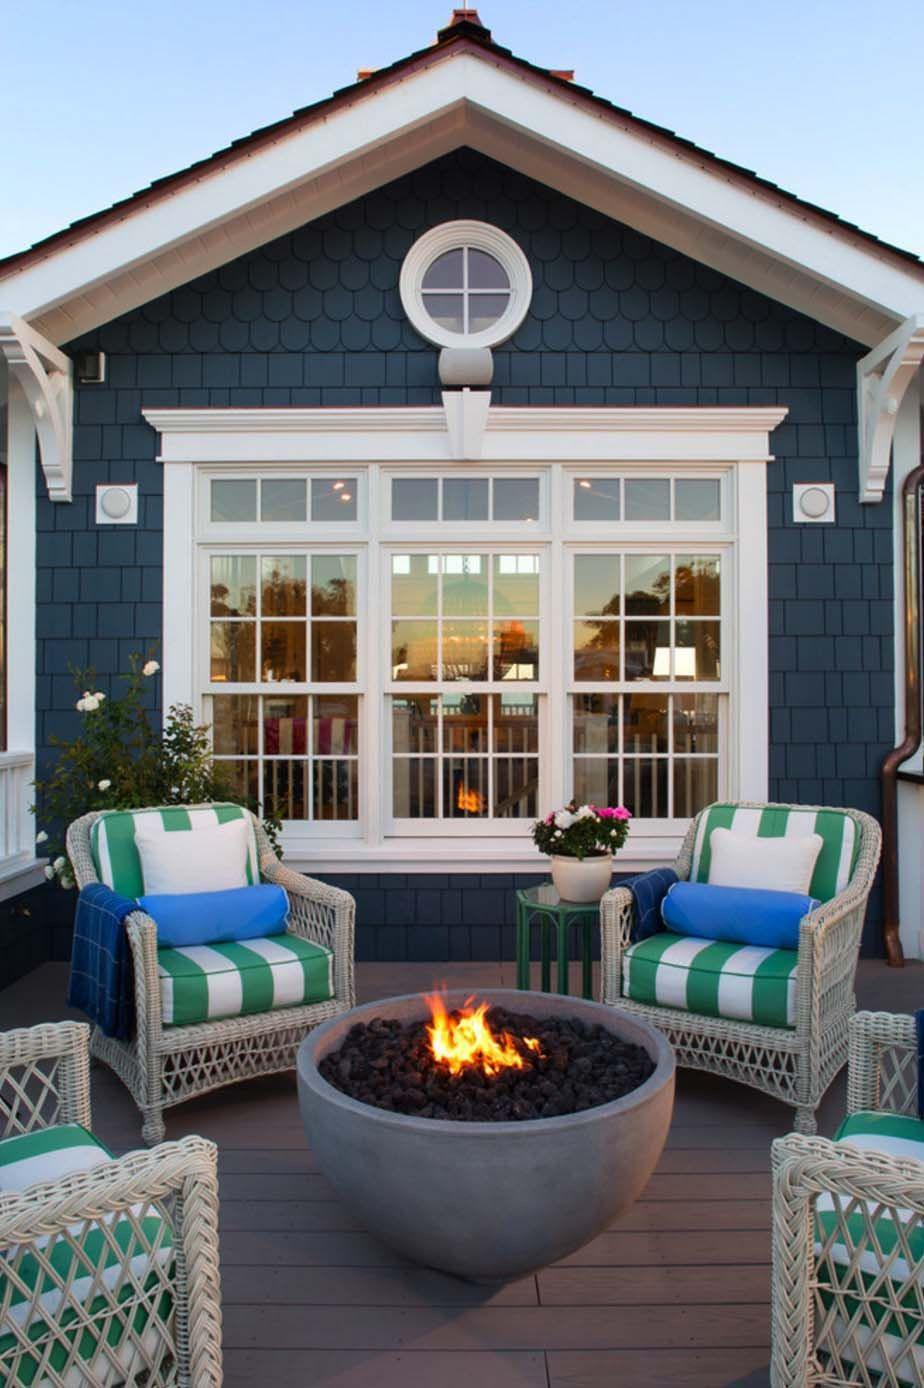 30 Amazing Beach Style Deck Ideas Promoting Relaxation Beach House Decor House Exterior Beach Cottage Style